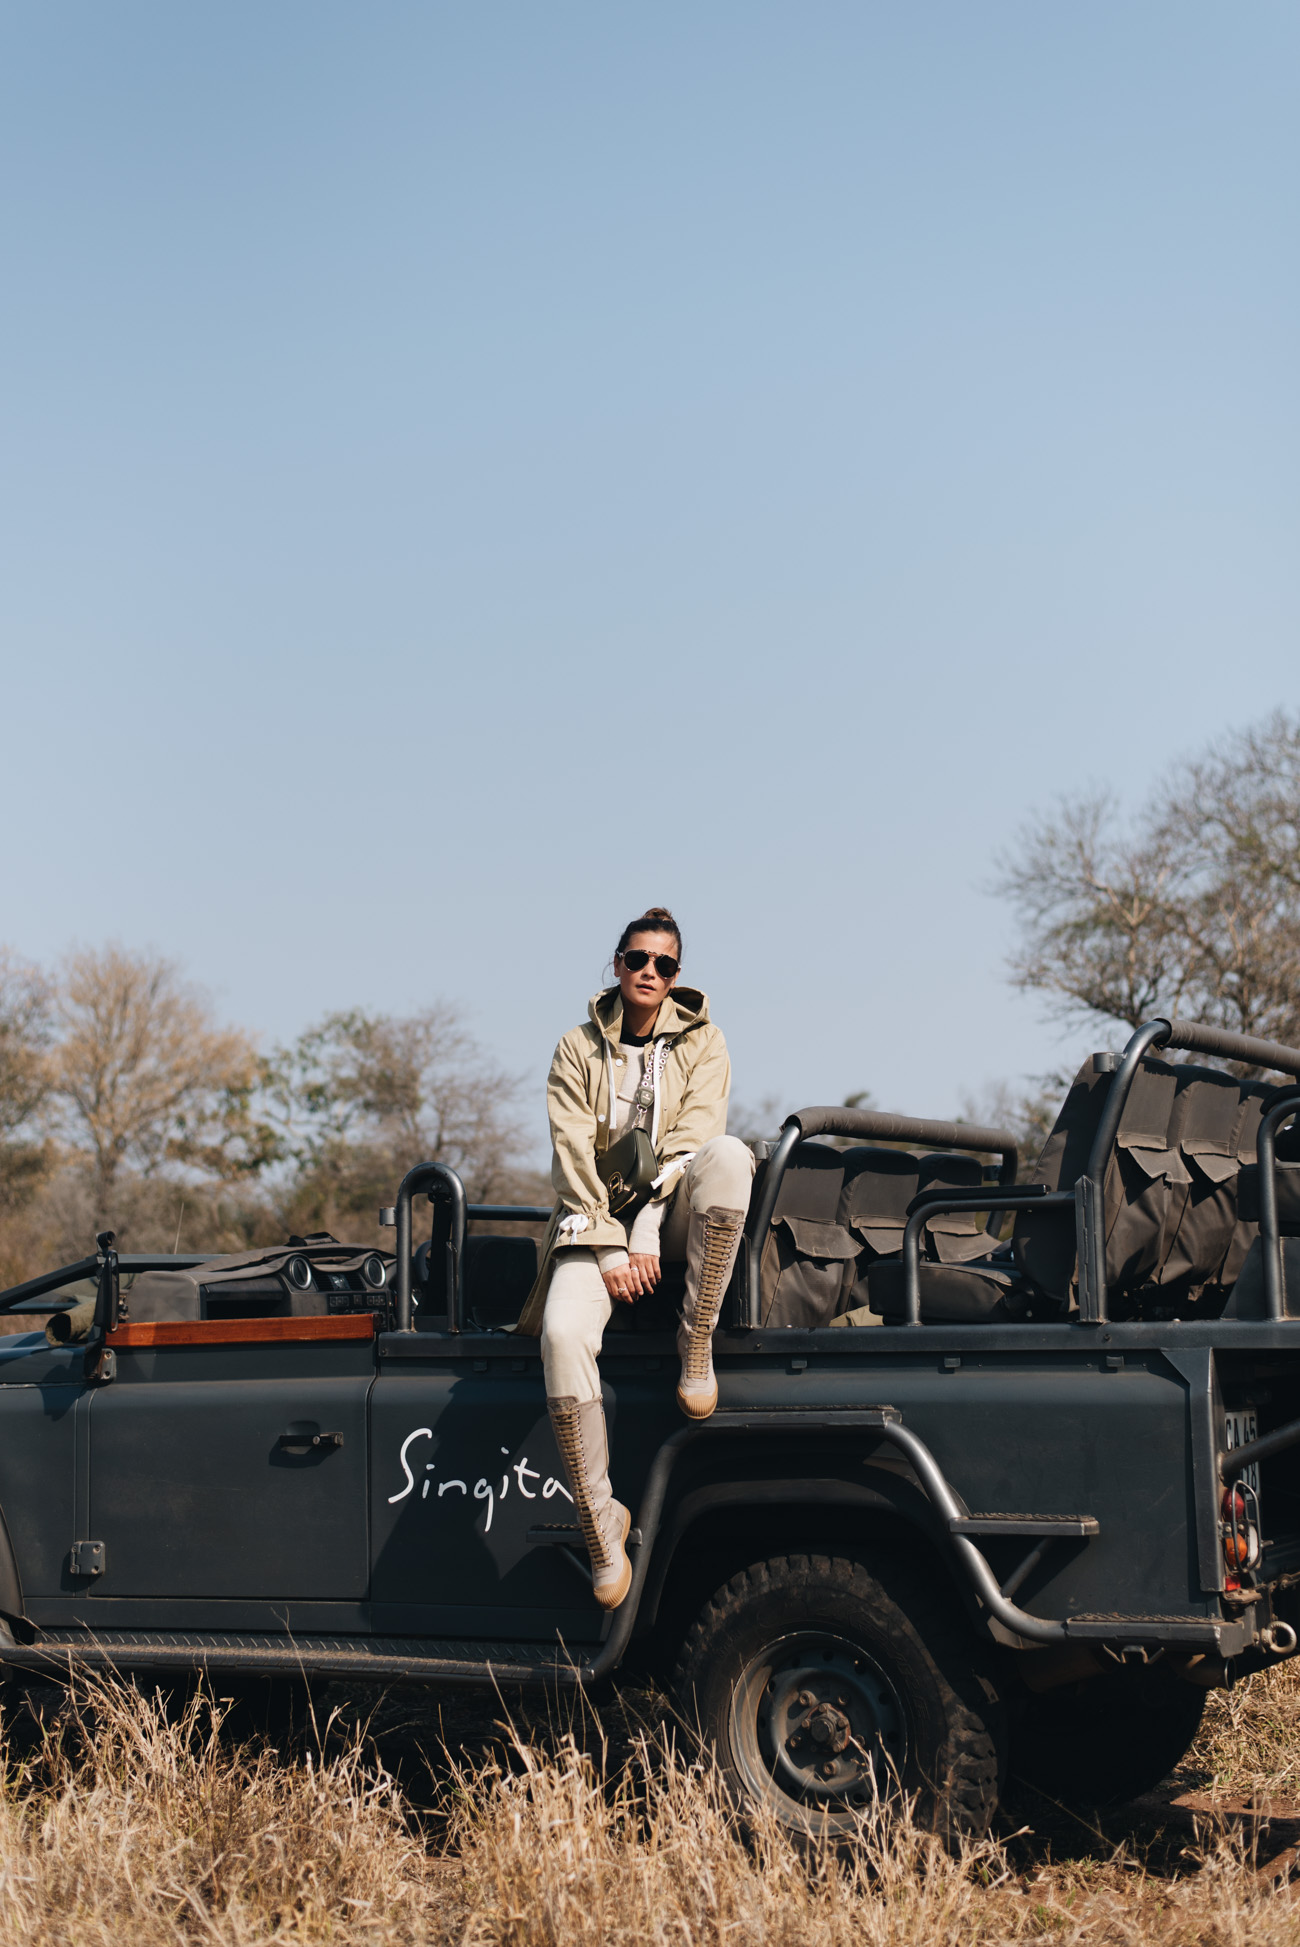 safari-afrika-beste-reisezeit-im-september-oktober-nina-schwichtenberg-fashiioncarpet